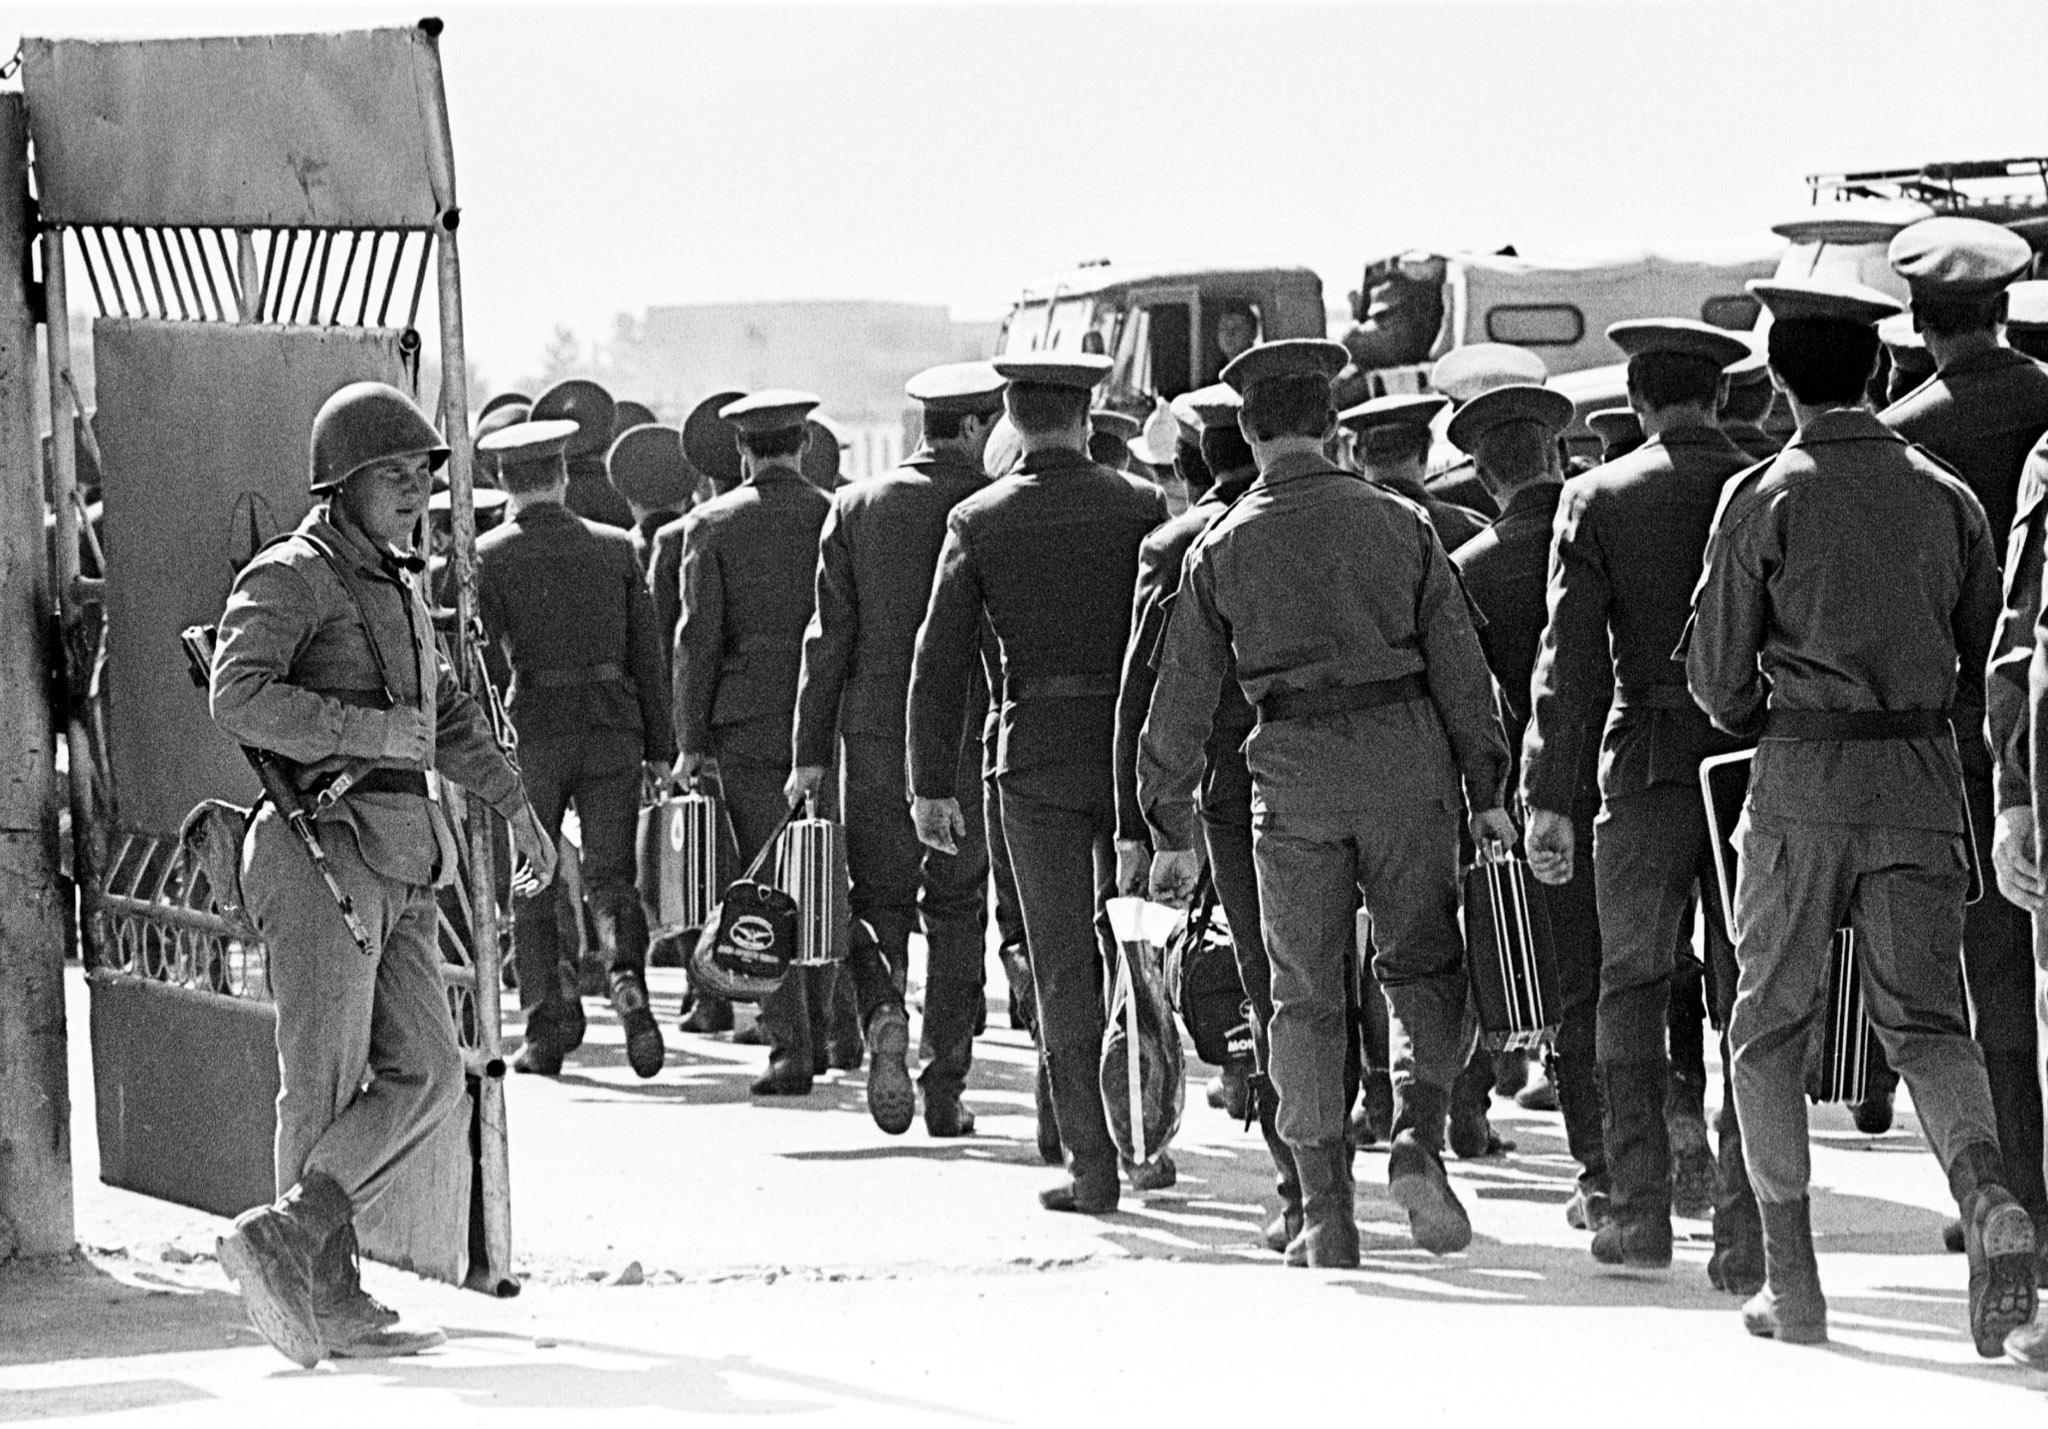 Soviet Afghanistan war - Page 6 Afghan-soviet-exit